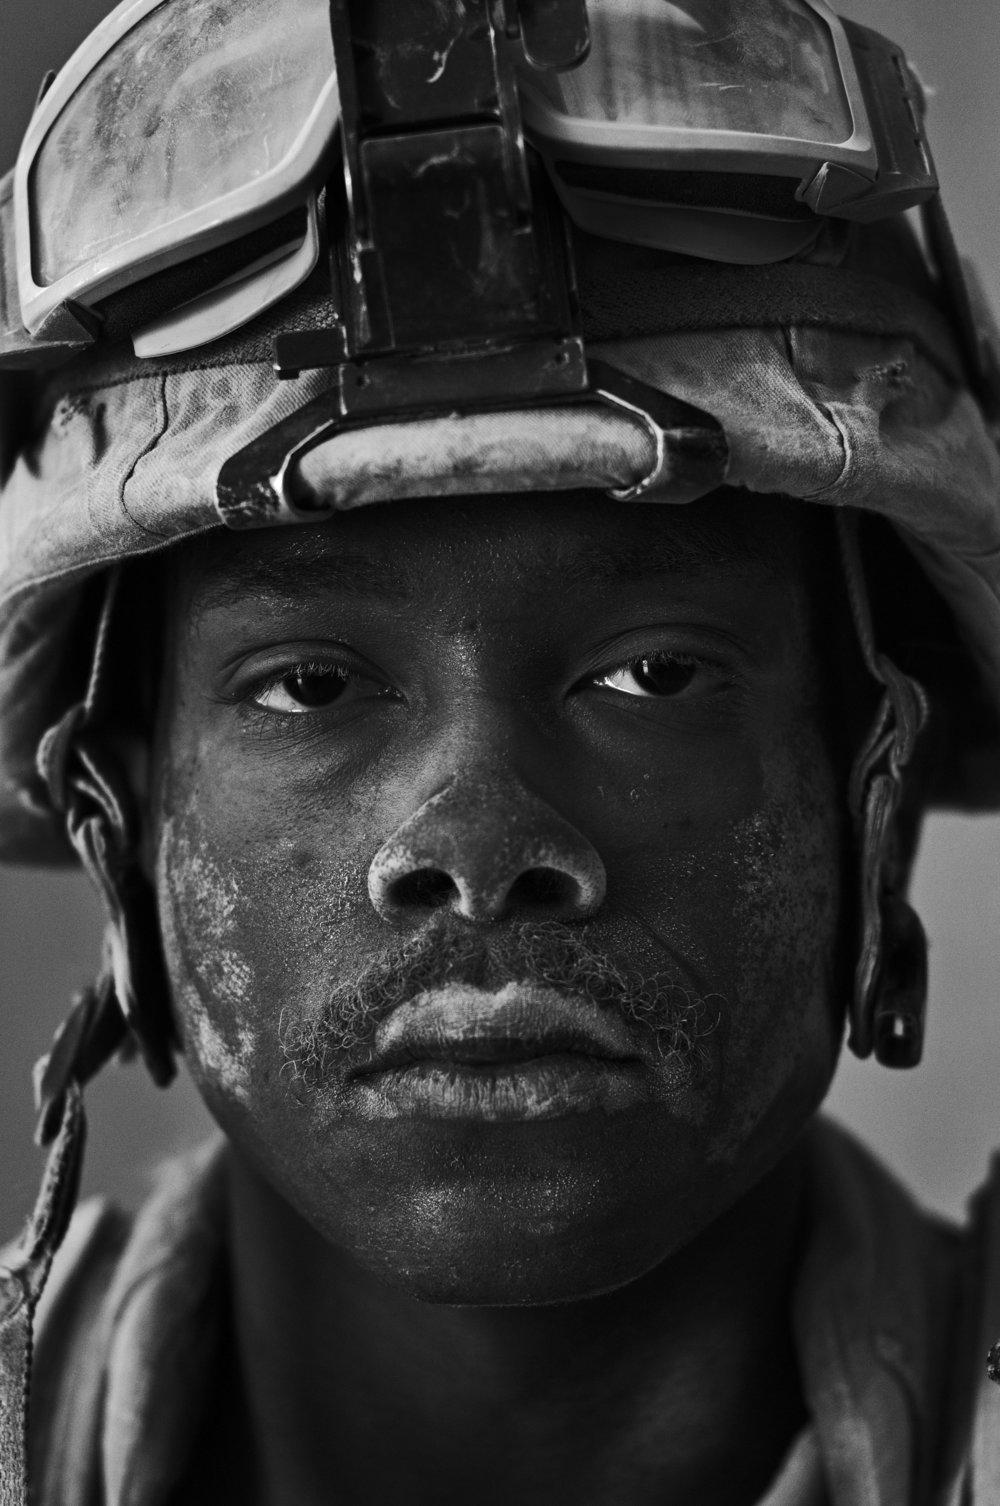 9-U.S. Marine Cpl. Philip Pepper